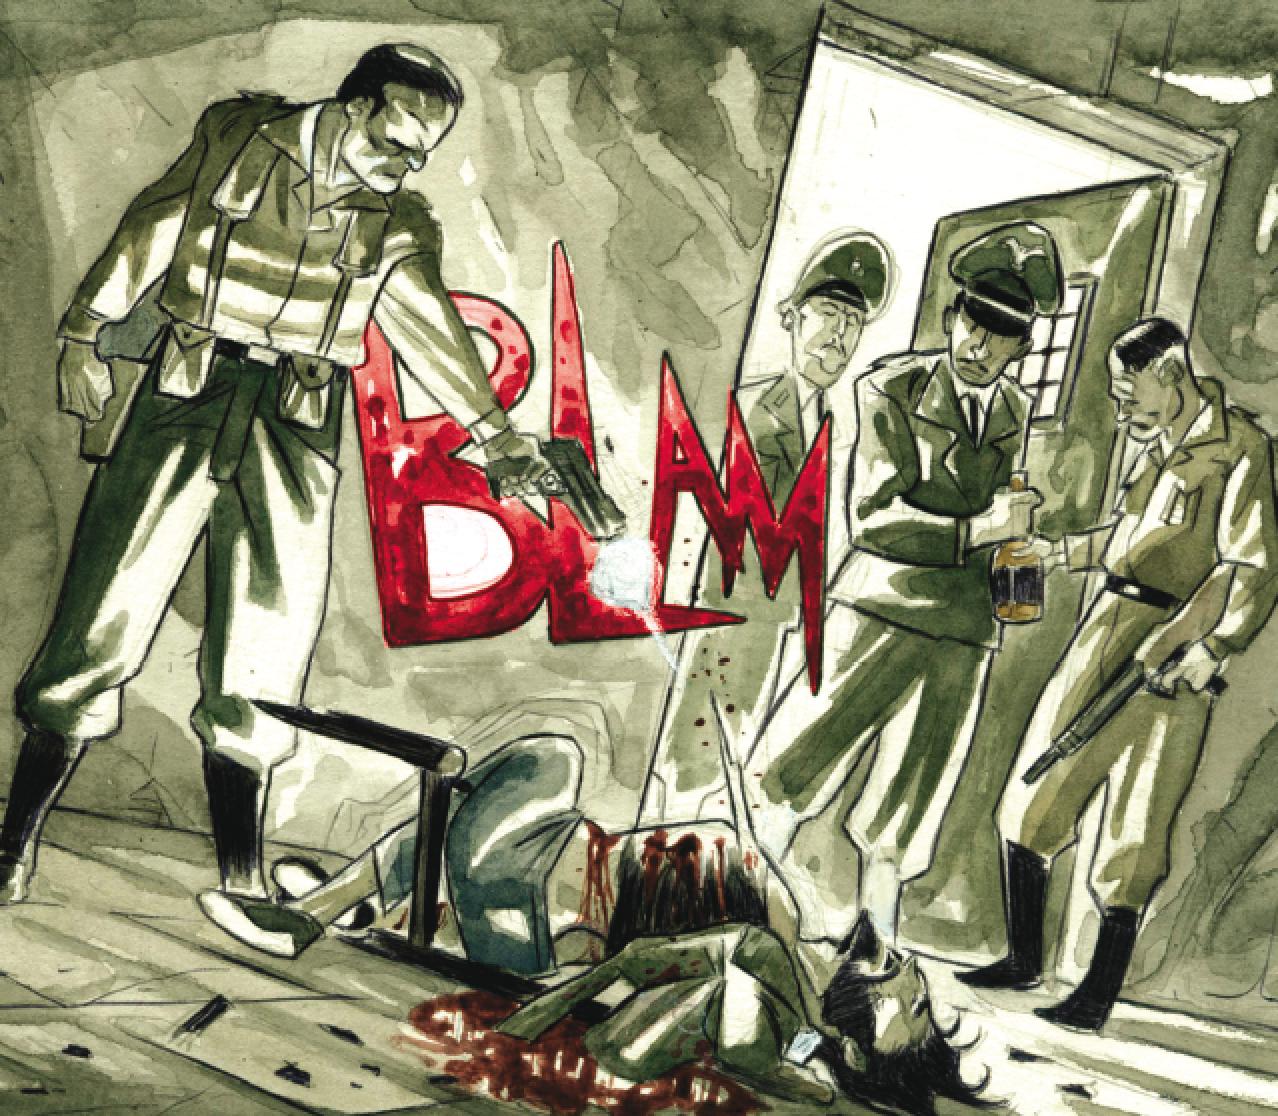 Execution of Che Guevara comic book3